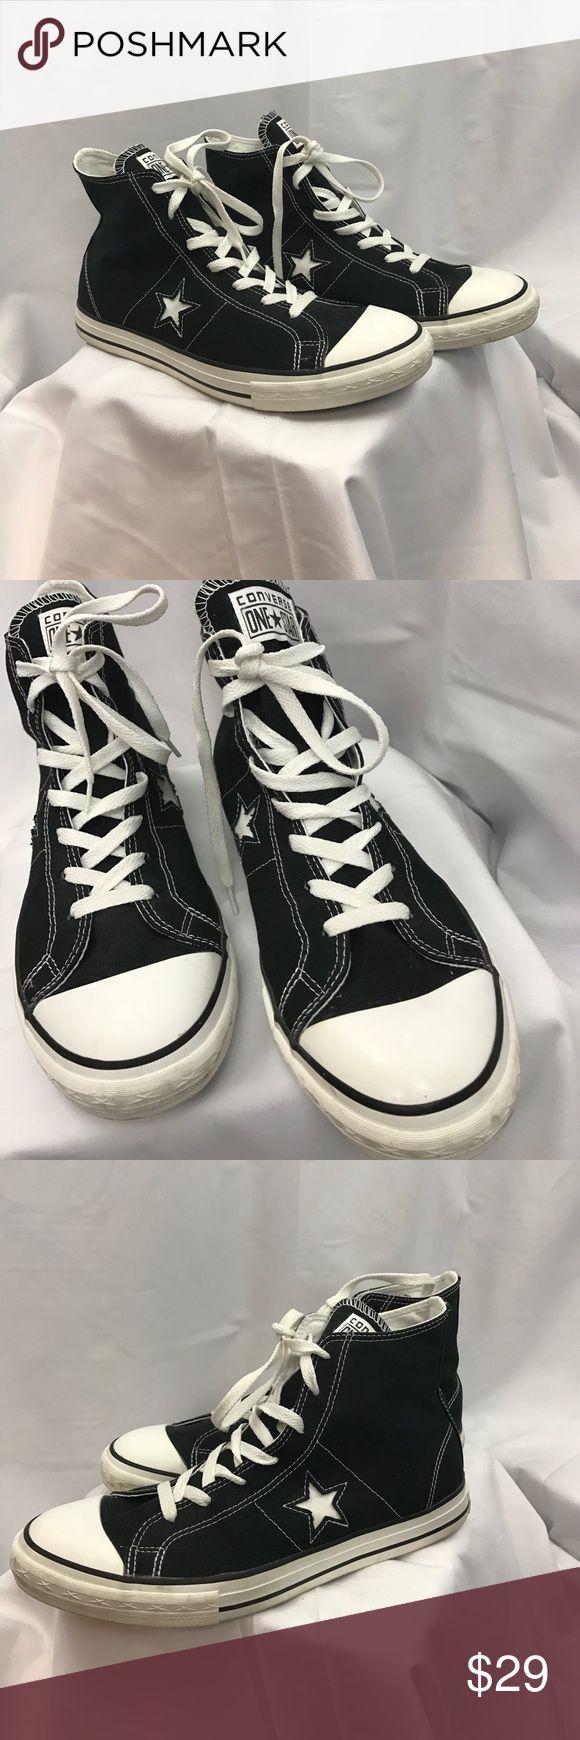 Converse All Star sz9.5 black high top sneakers Excellent used condition Converse All Star sz9.5 black high top sneakers... Converse Shoes Athletic Shoes